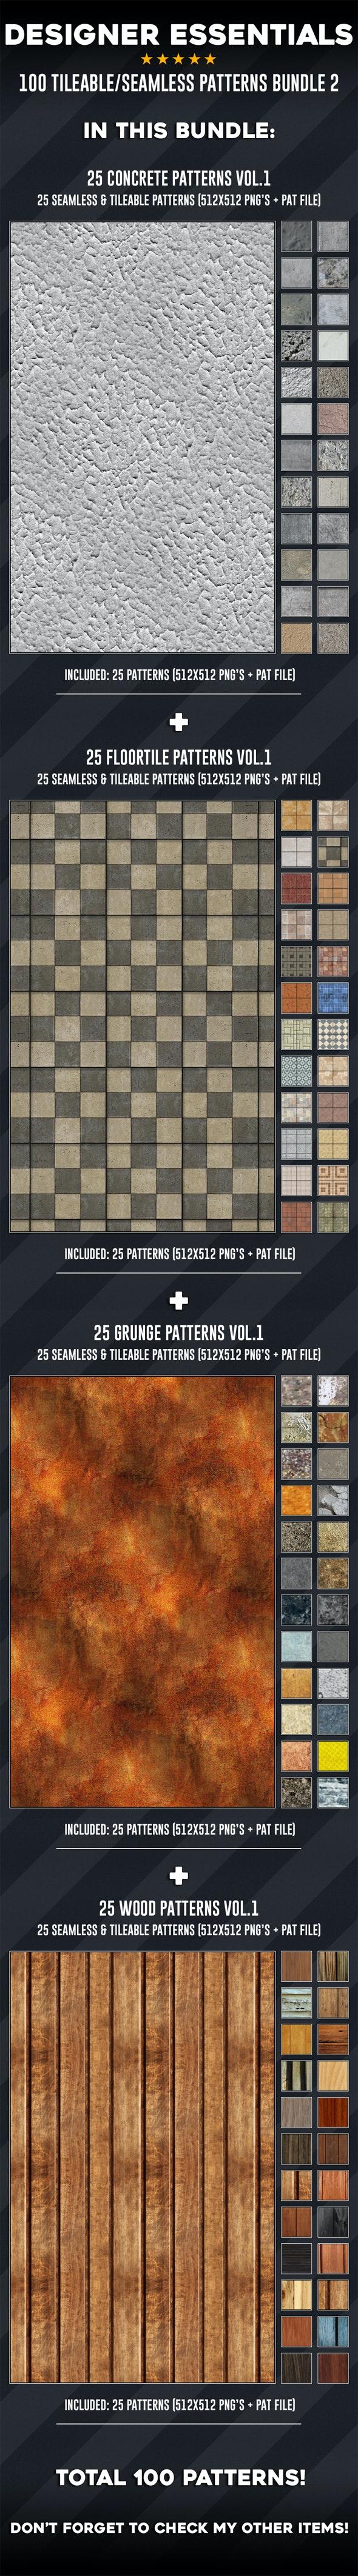 100 Tileable / Seamless Patterns Bundle Vol.2 - Miscellaneous Textures / Fills / Patterns